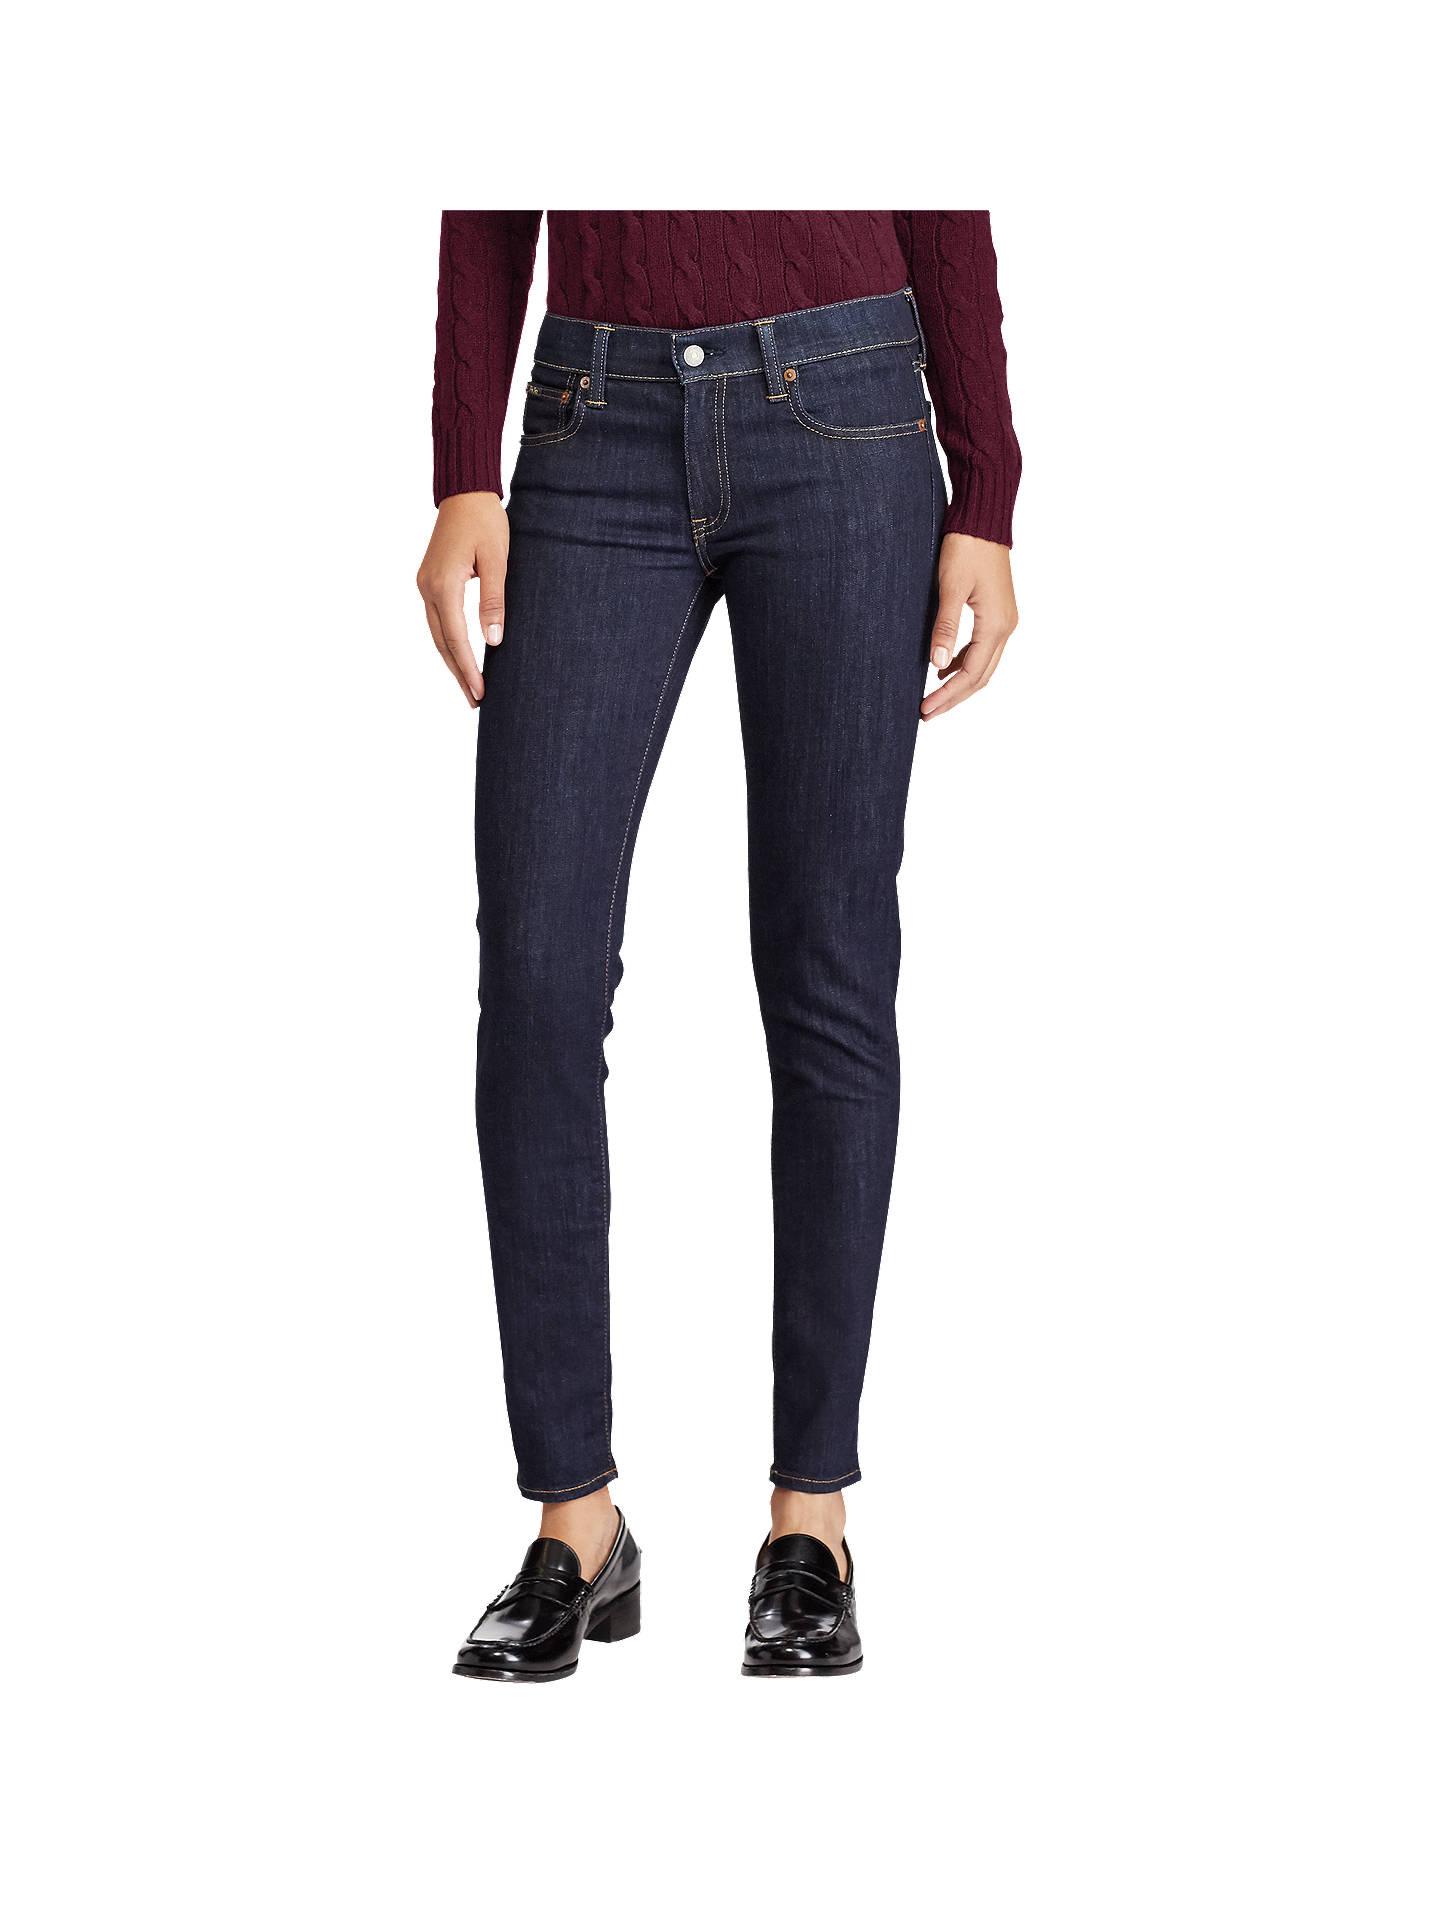 db9c9cb815 Polo Ralph Lauren Tompkins Skinny Jeans, Rinse at John Lewis & Partners